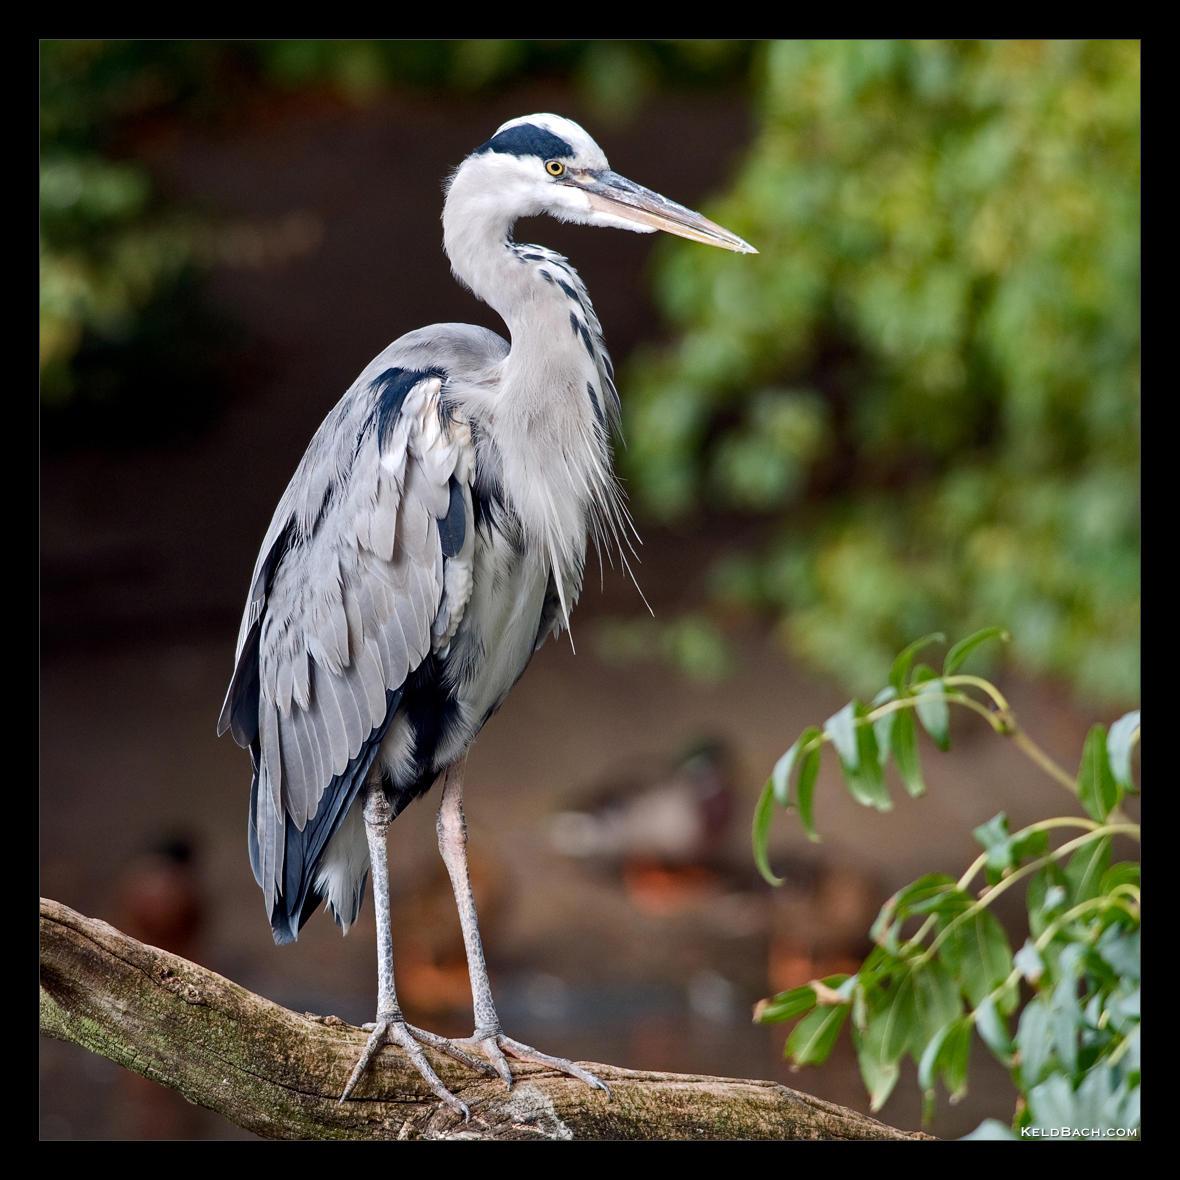 Grey Heron by KeldBach